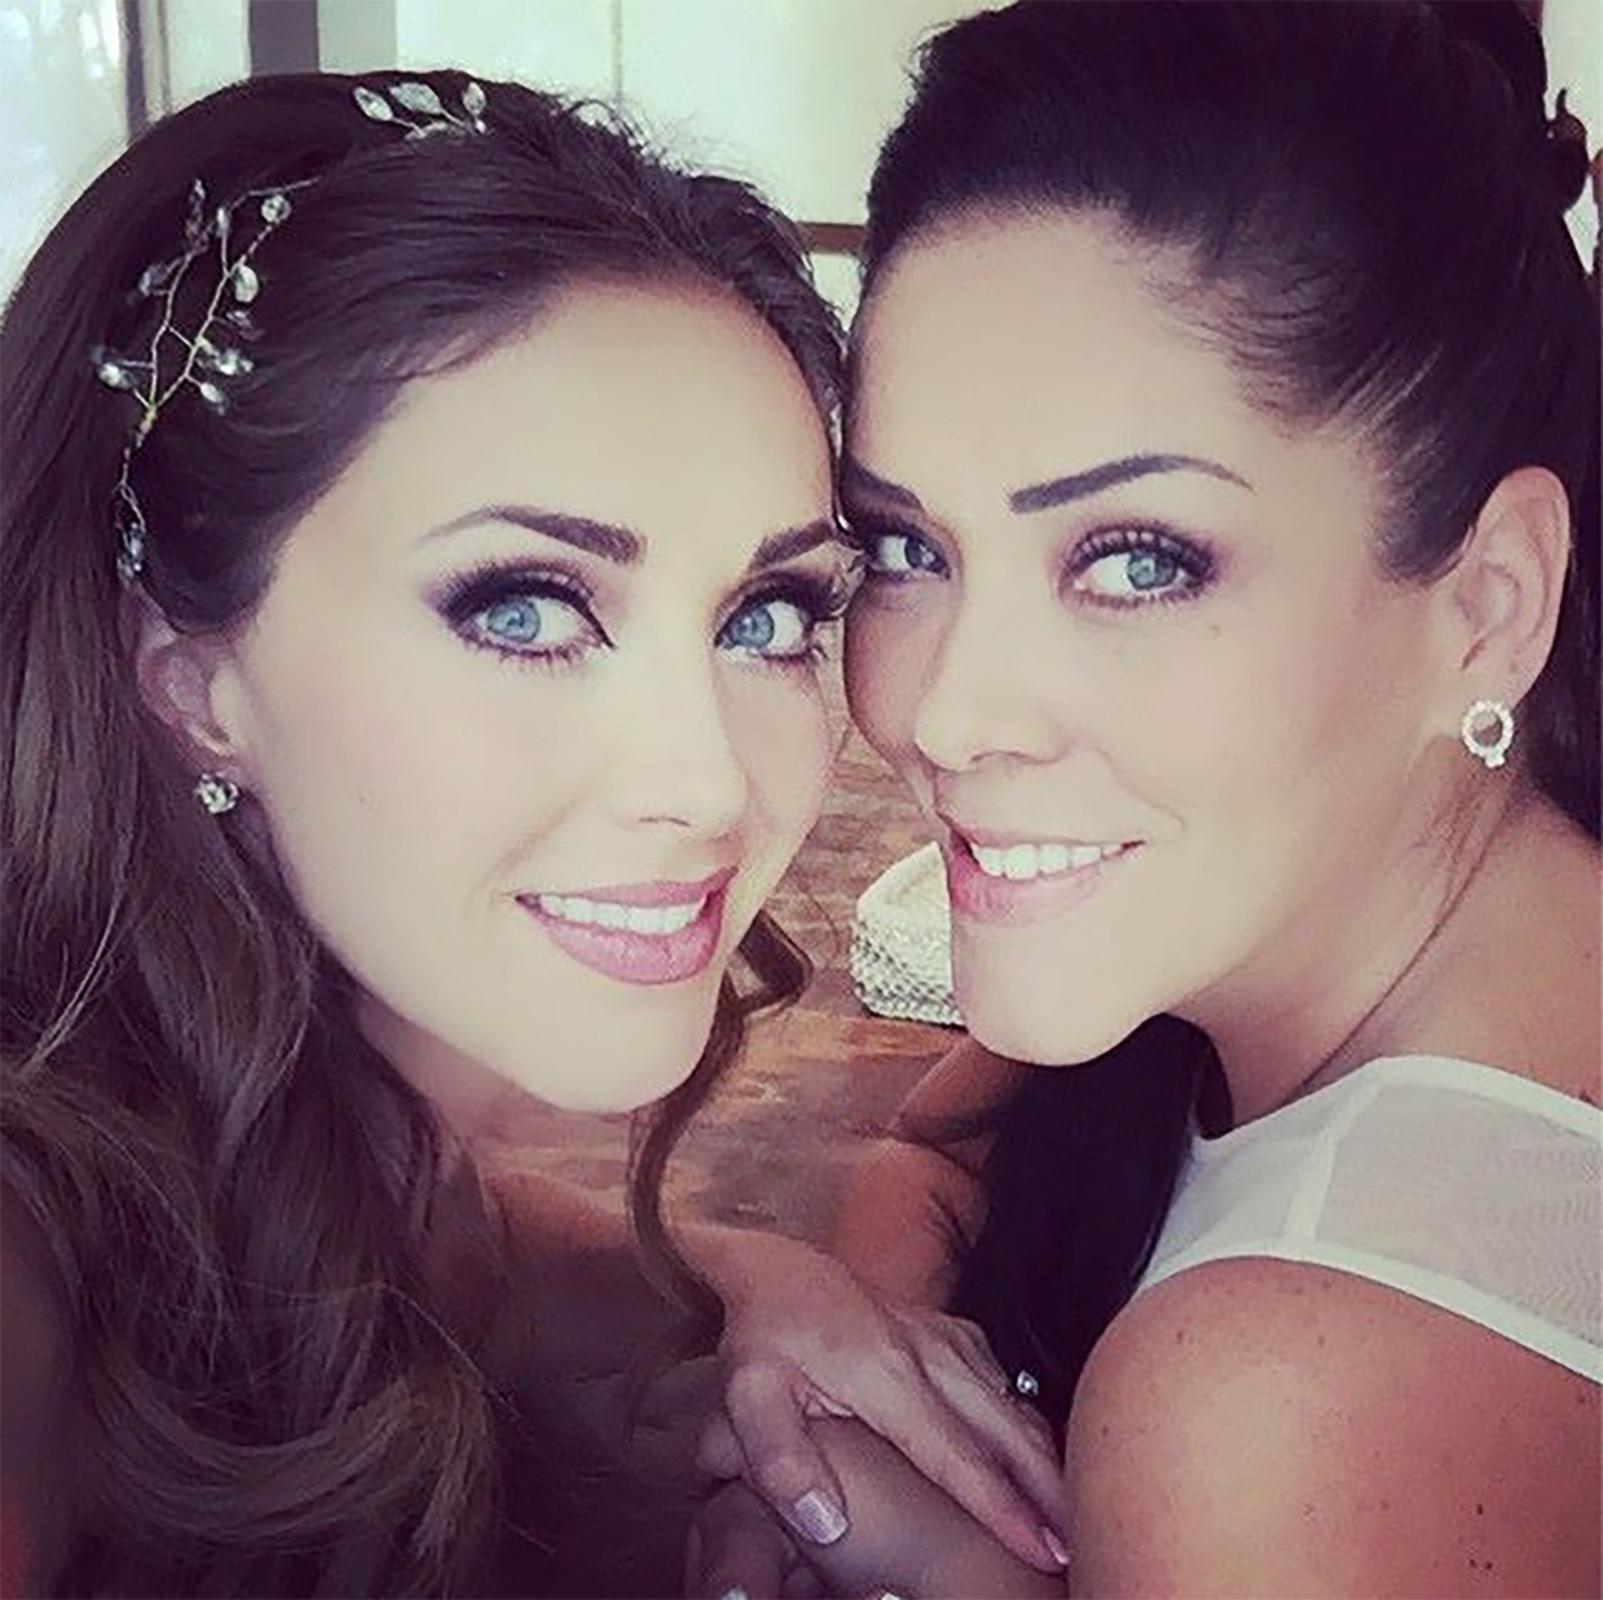 Anahí y su hermana mayor, Marichelo